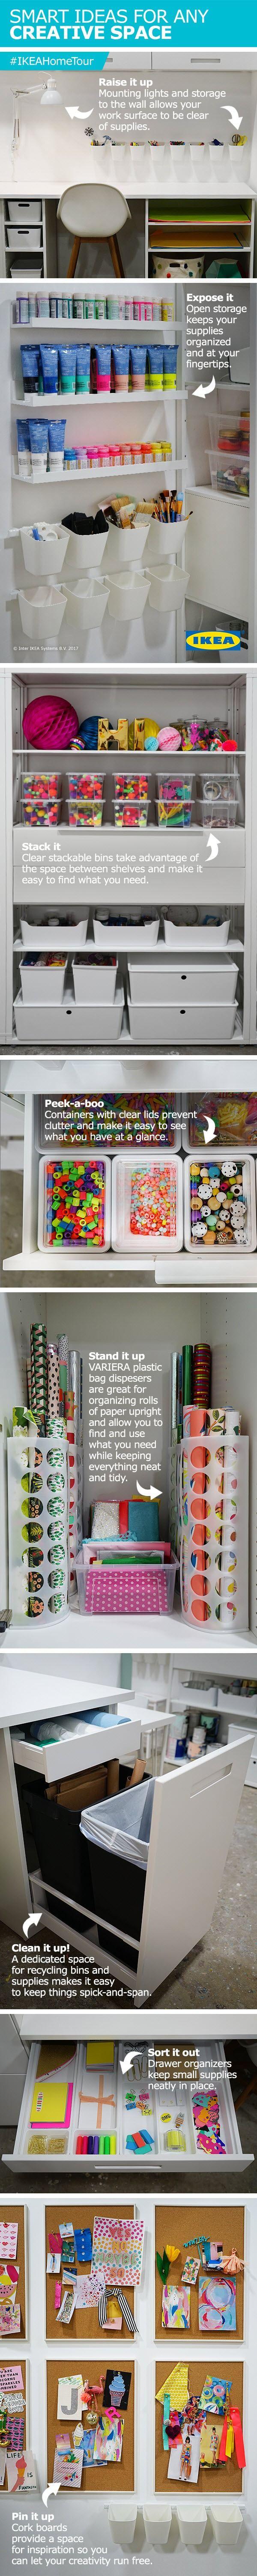 best aménagement maison images on pinterest organization ideas